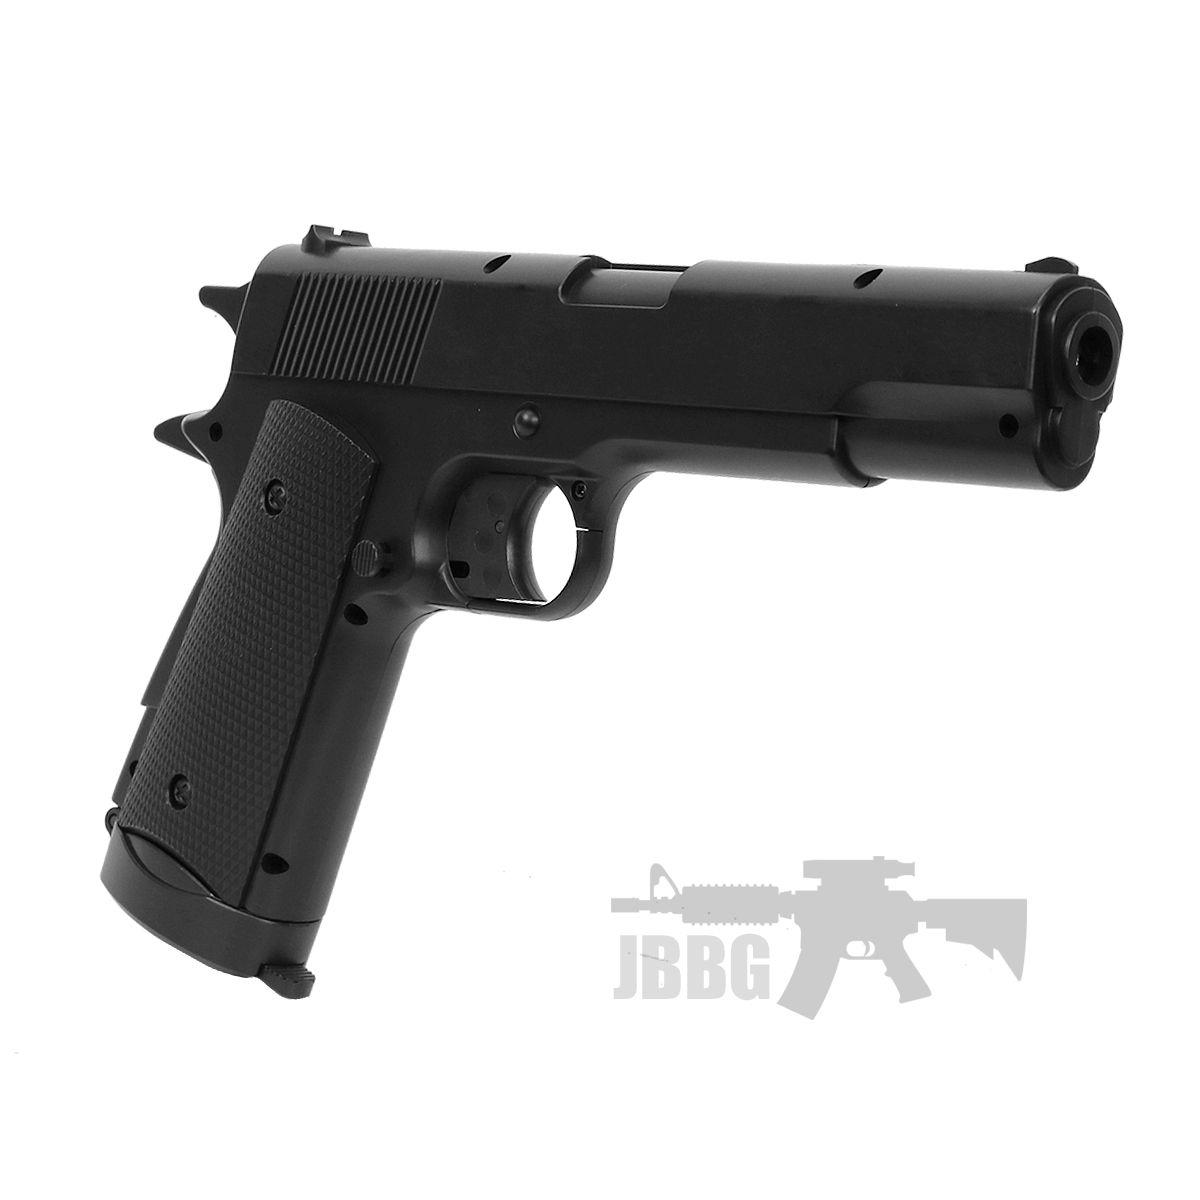 hgc312 airsoft gas pistol jbbg 7